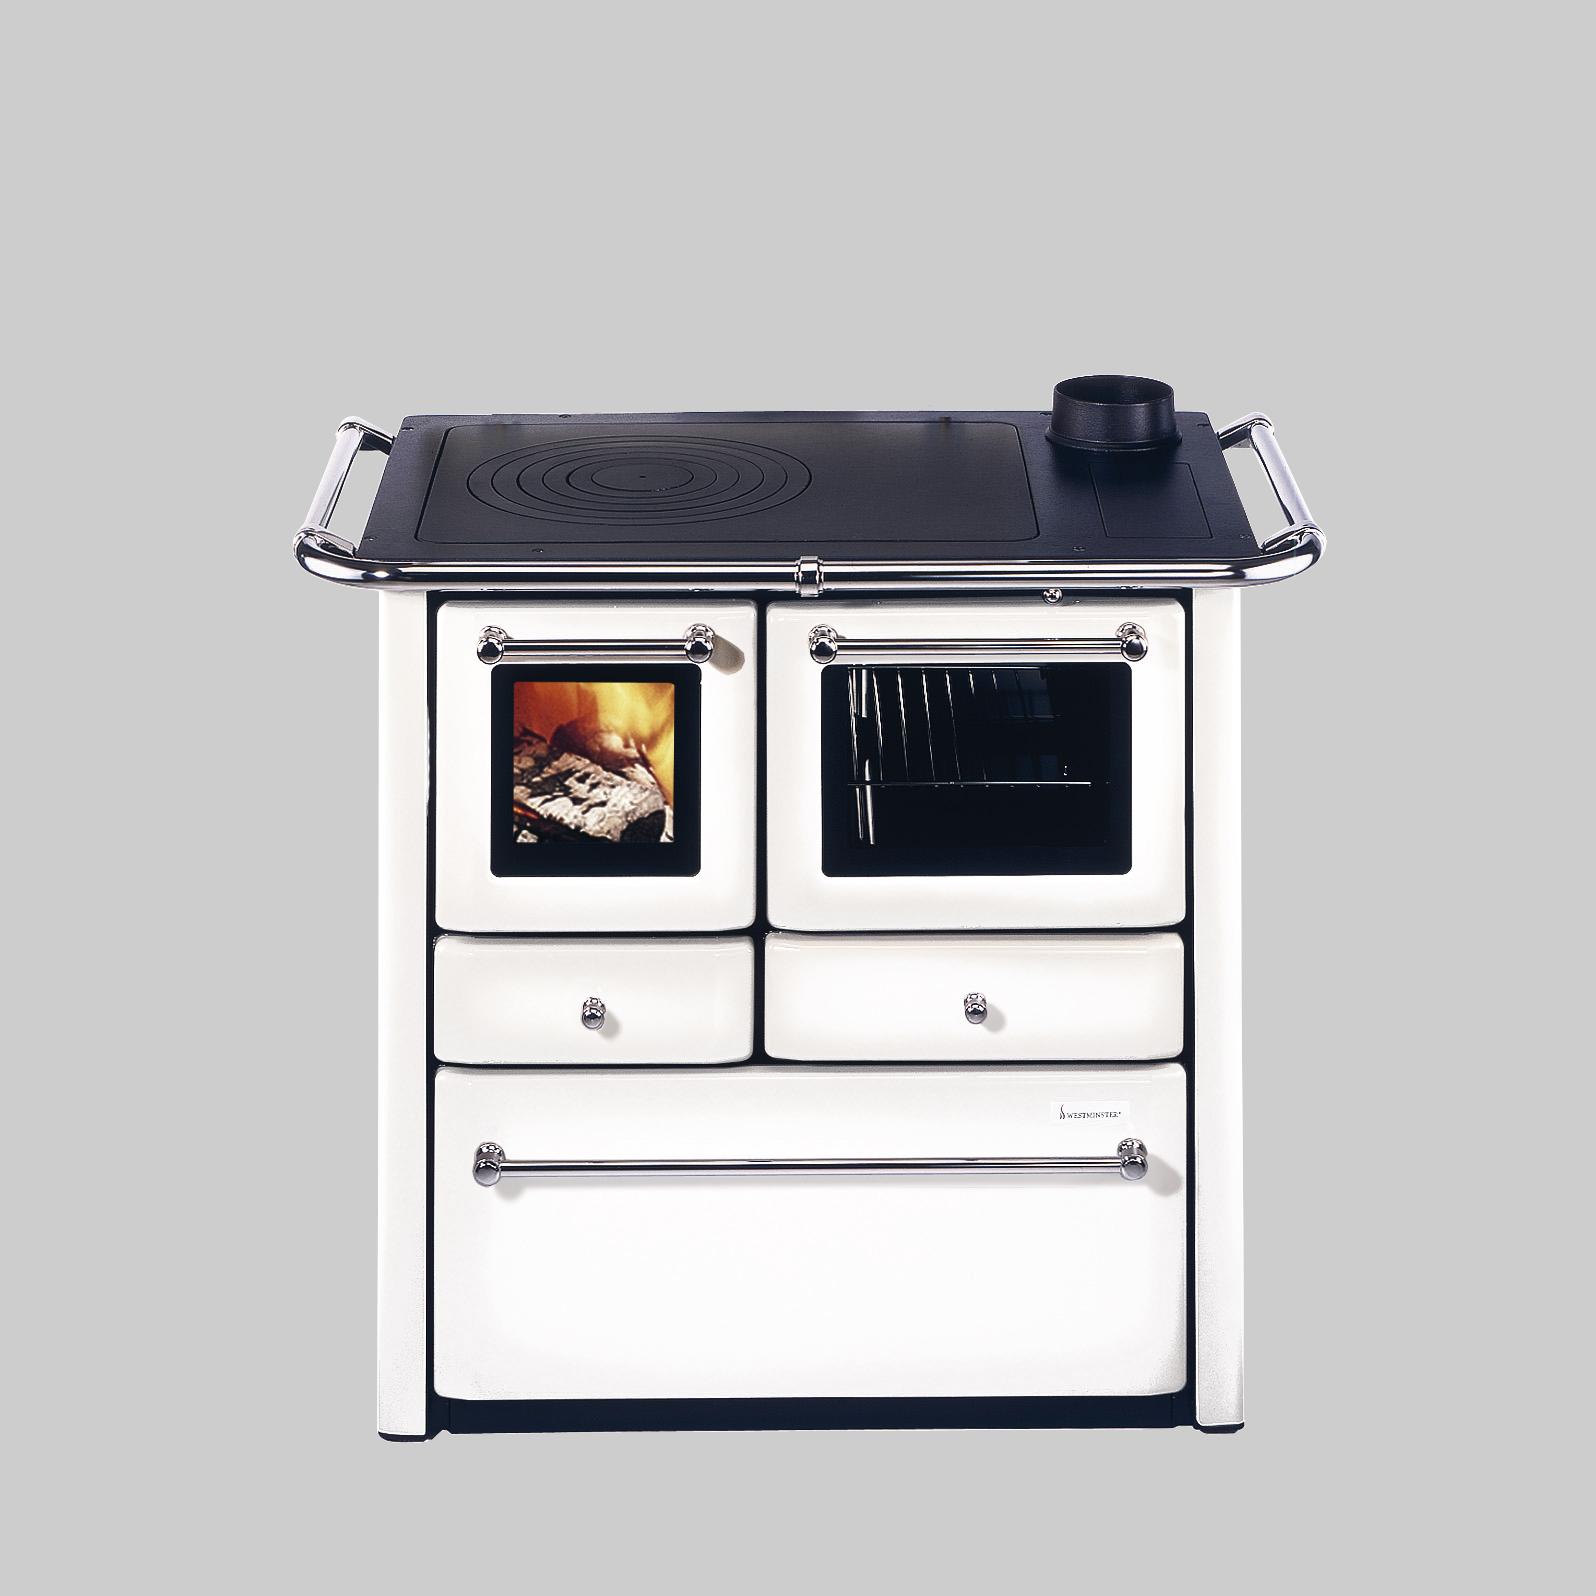 dauerbrandherd k 185 f weiss wamsler gmbh. Black Bedroom Furniture Sets. Home Design Ideas